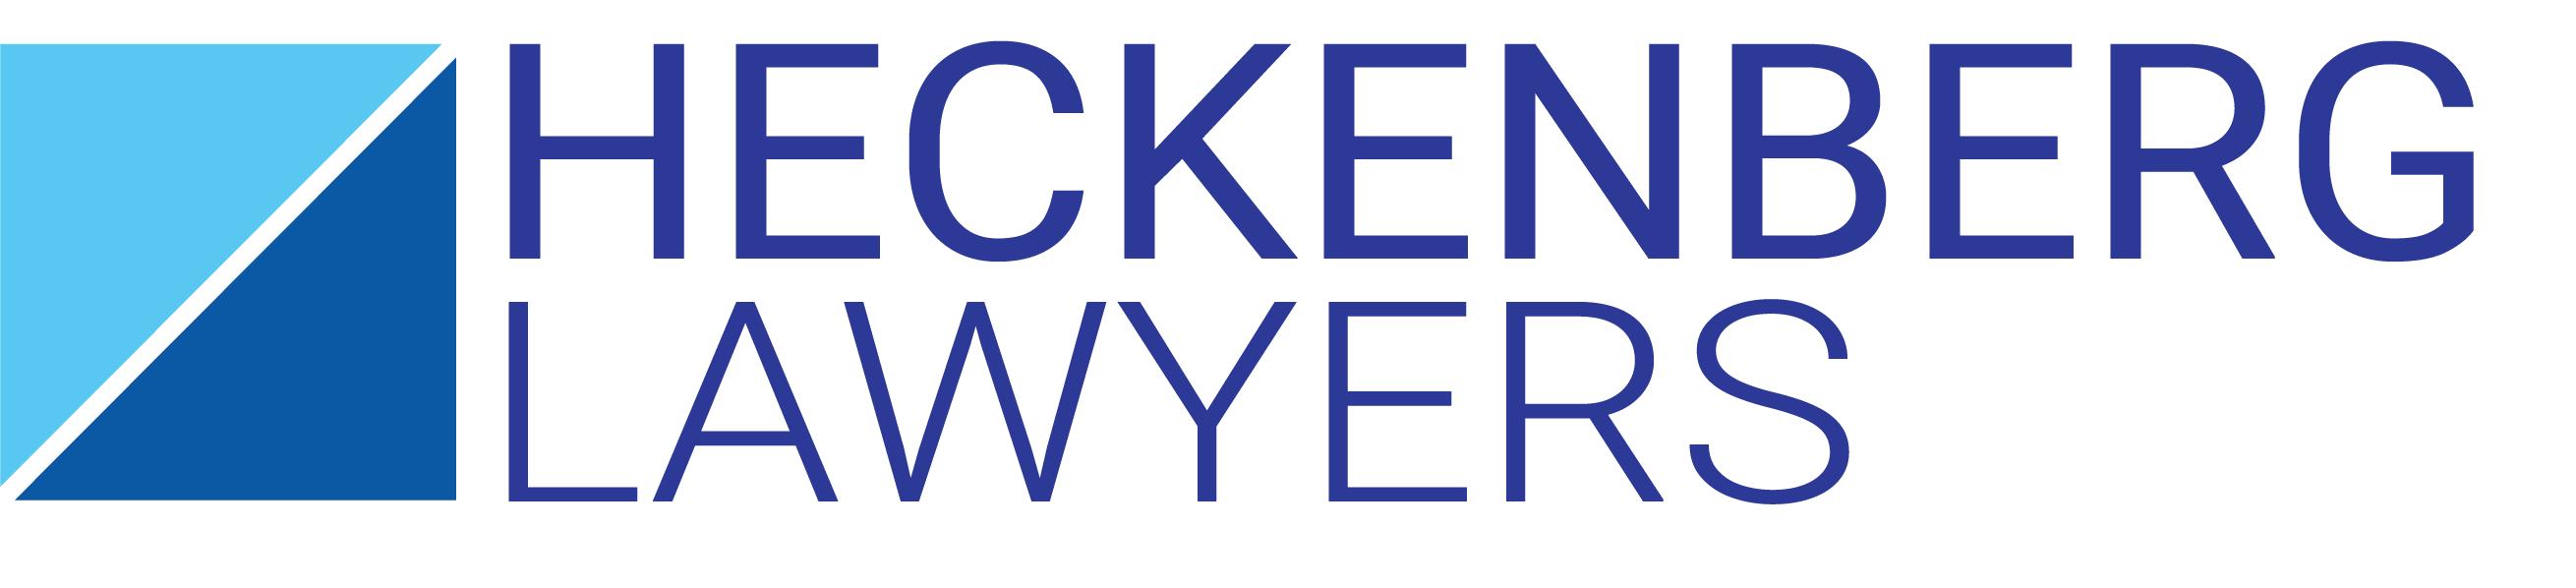 Heckenberg Lawyers